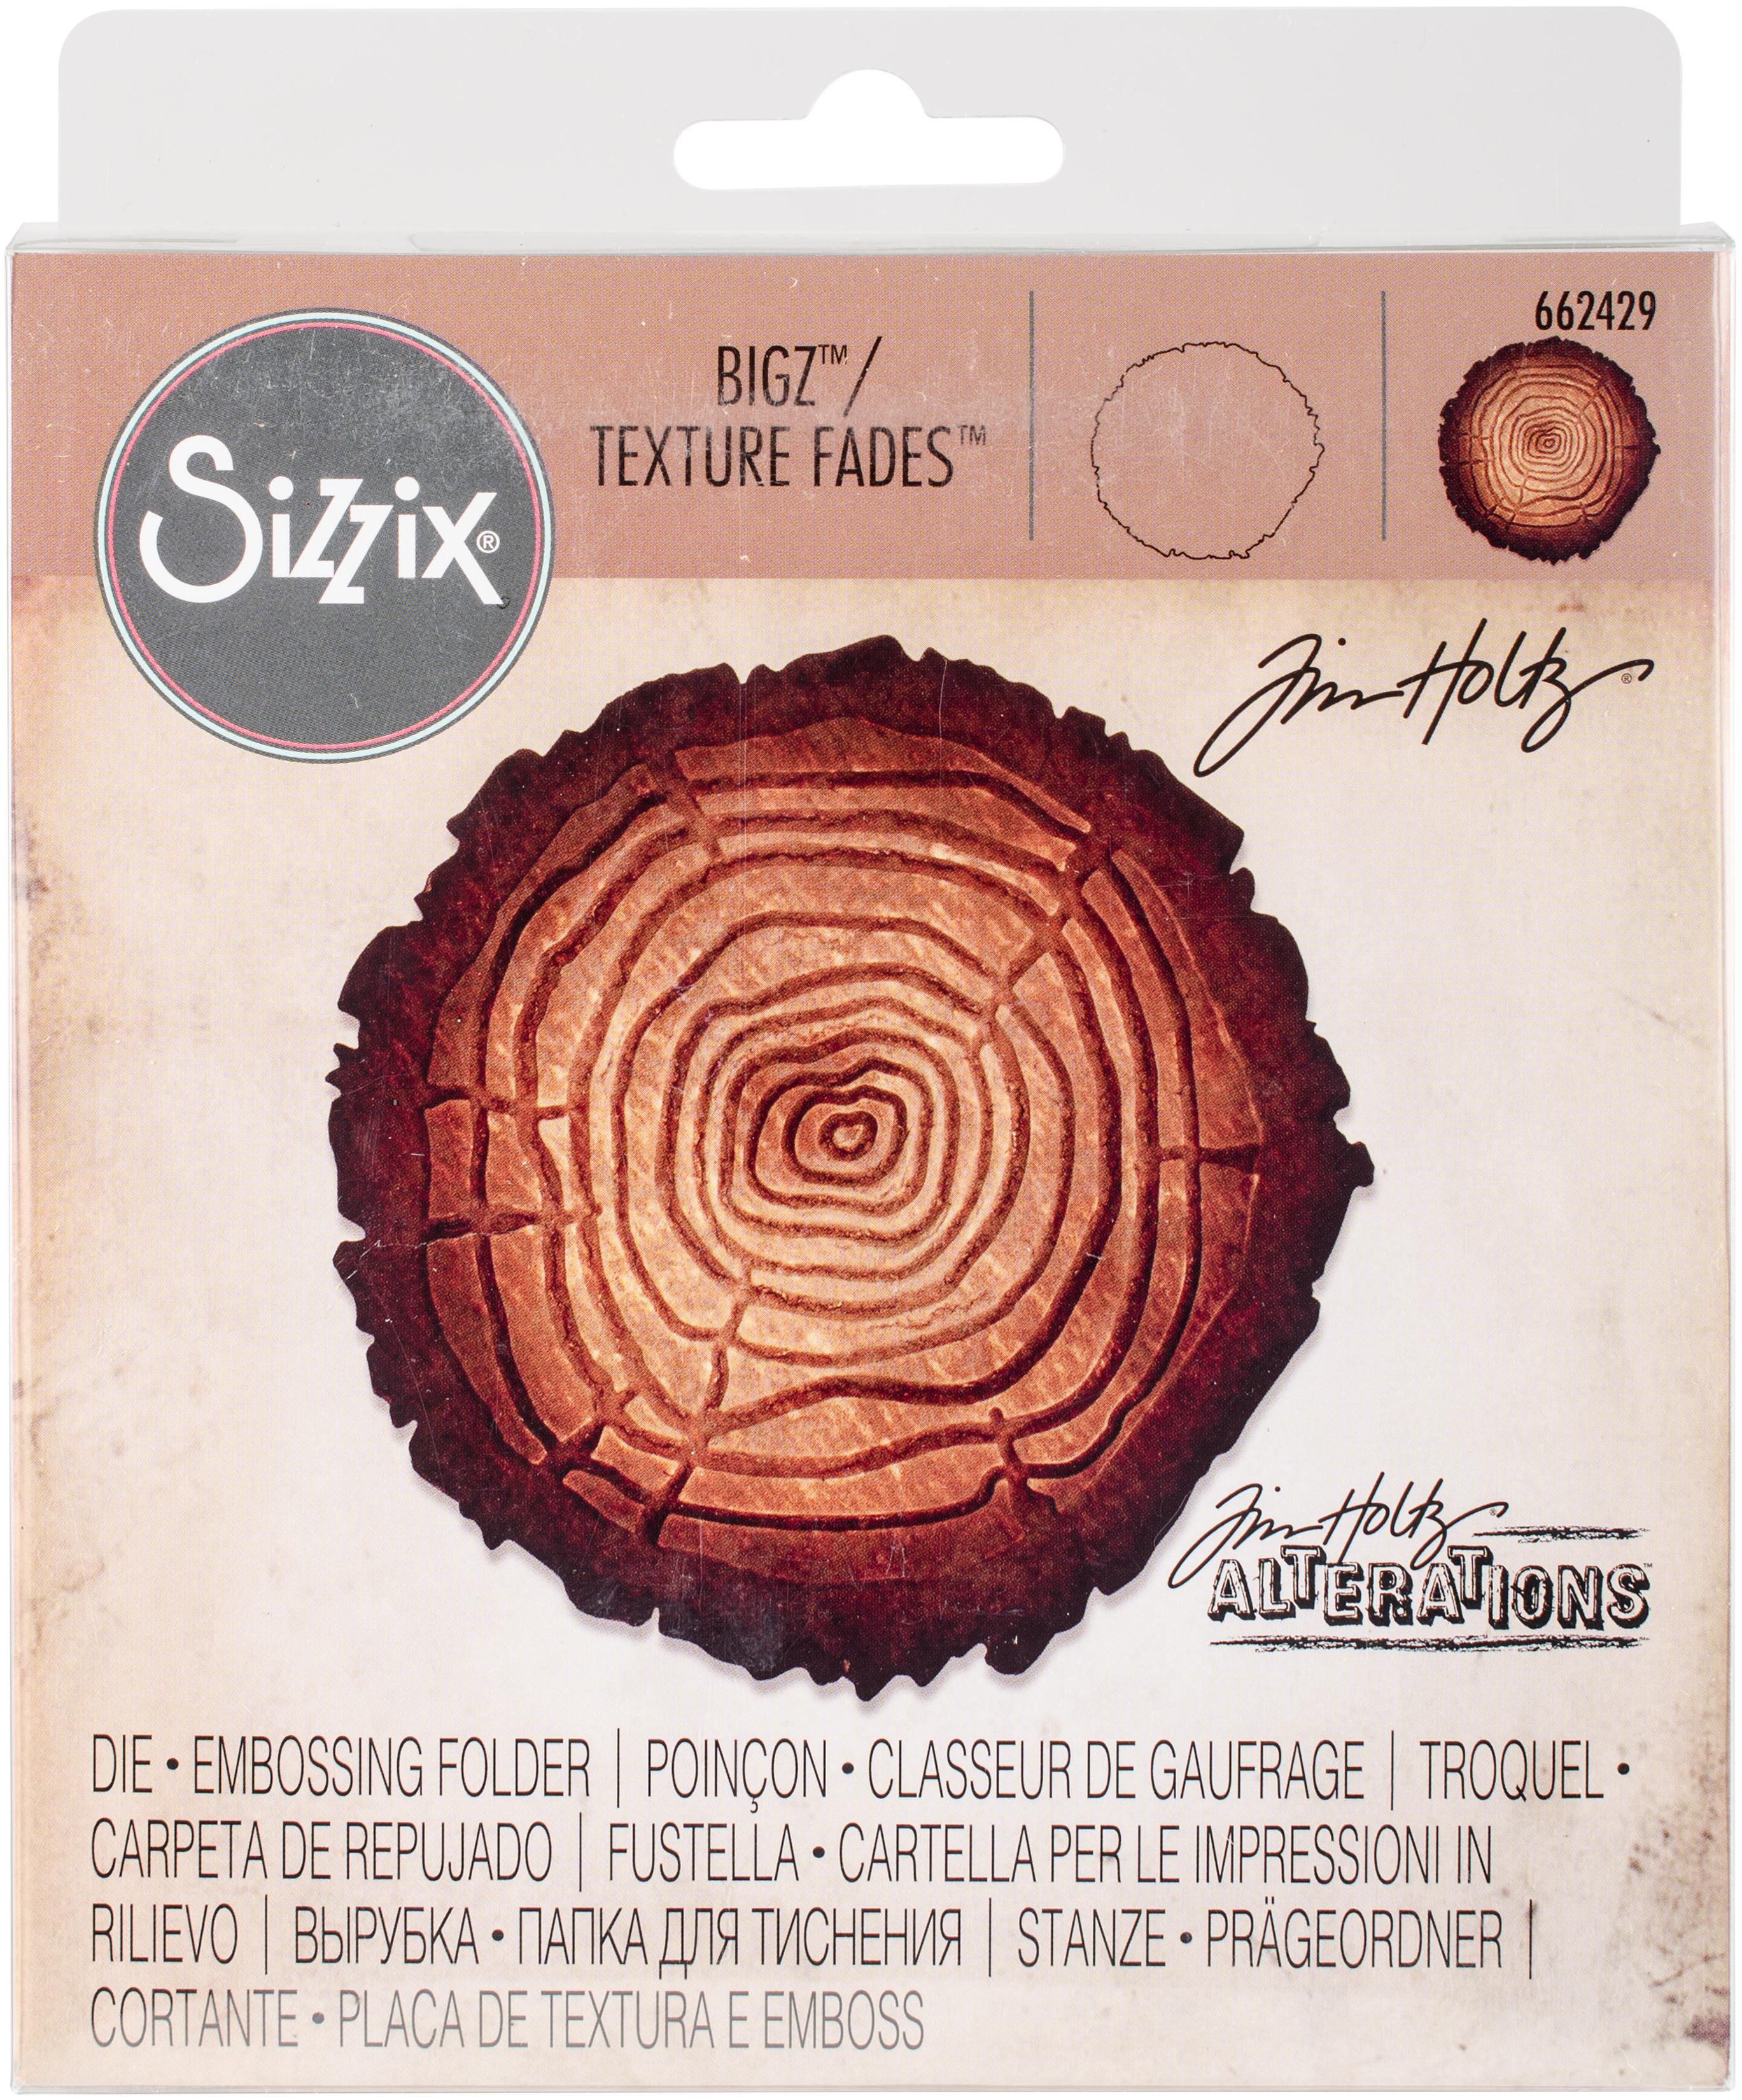 Sizzix Bigz Die W/A2 Texture Fades Folder By Tim Holtz-Tree Rings